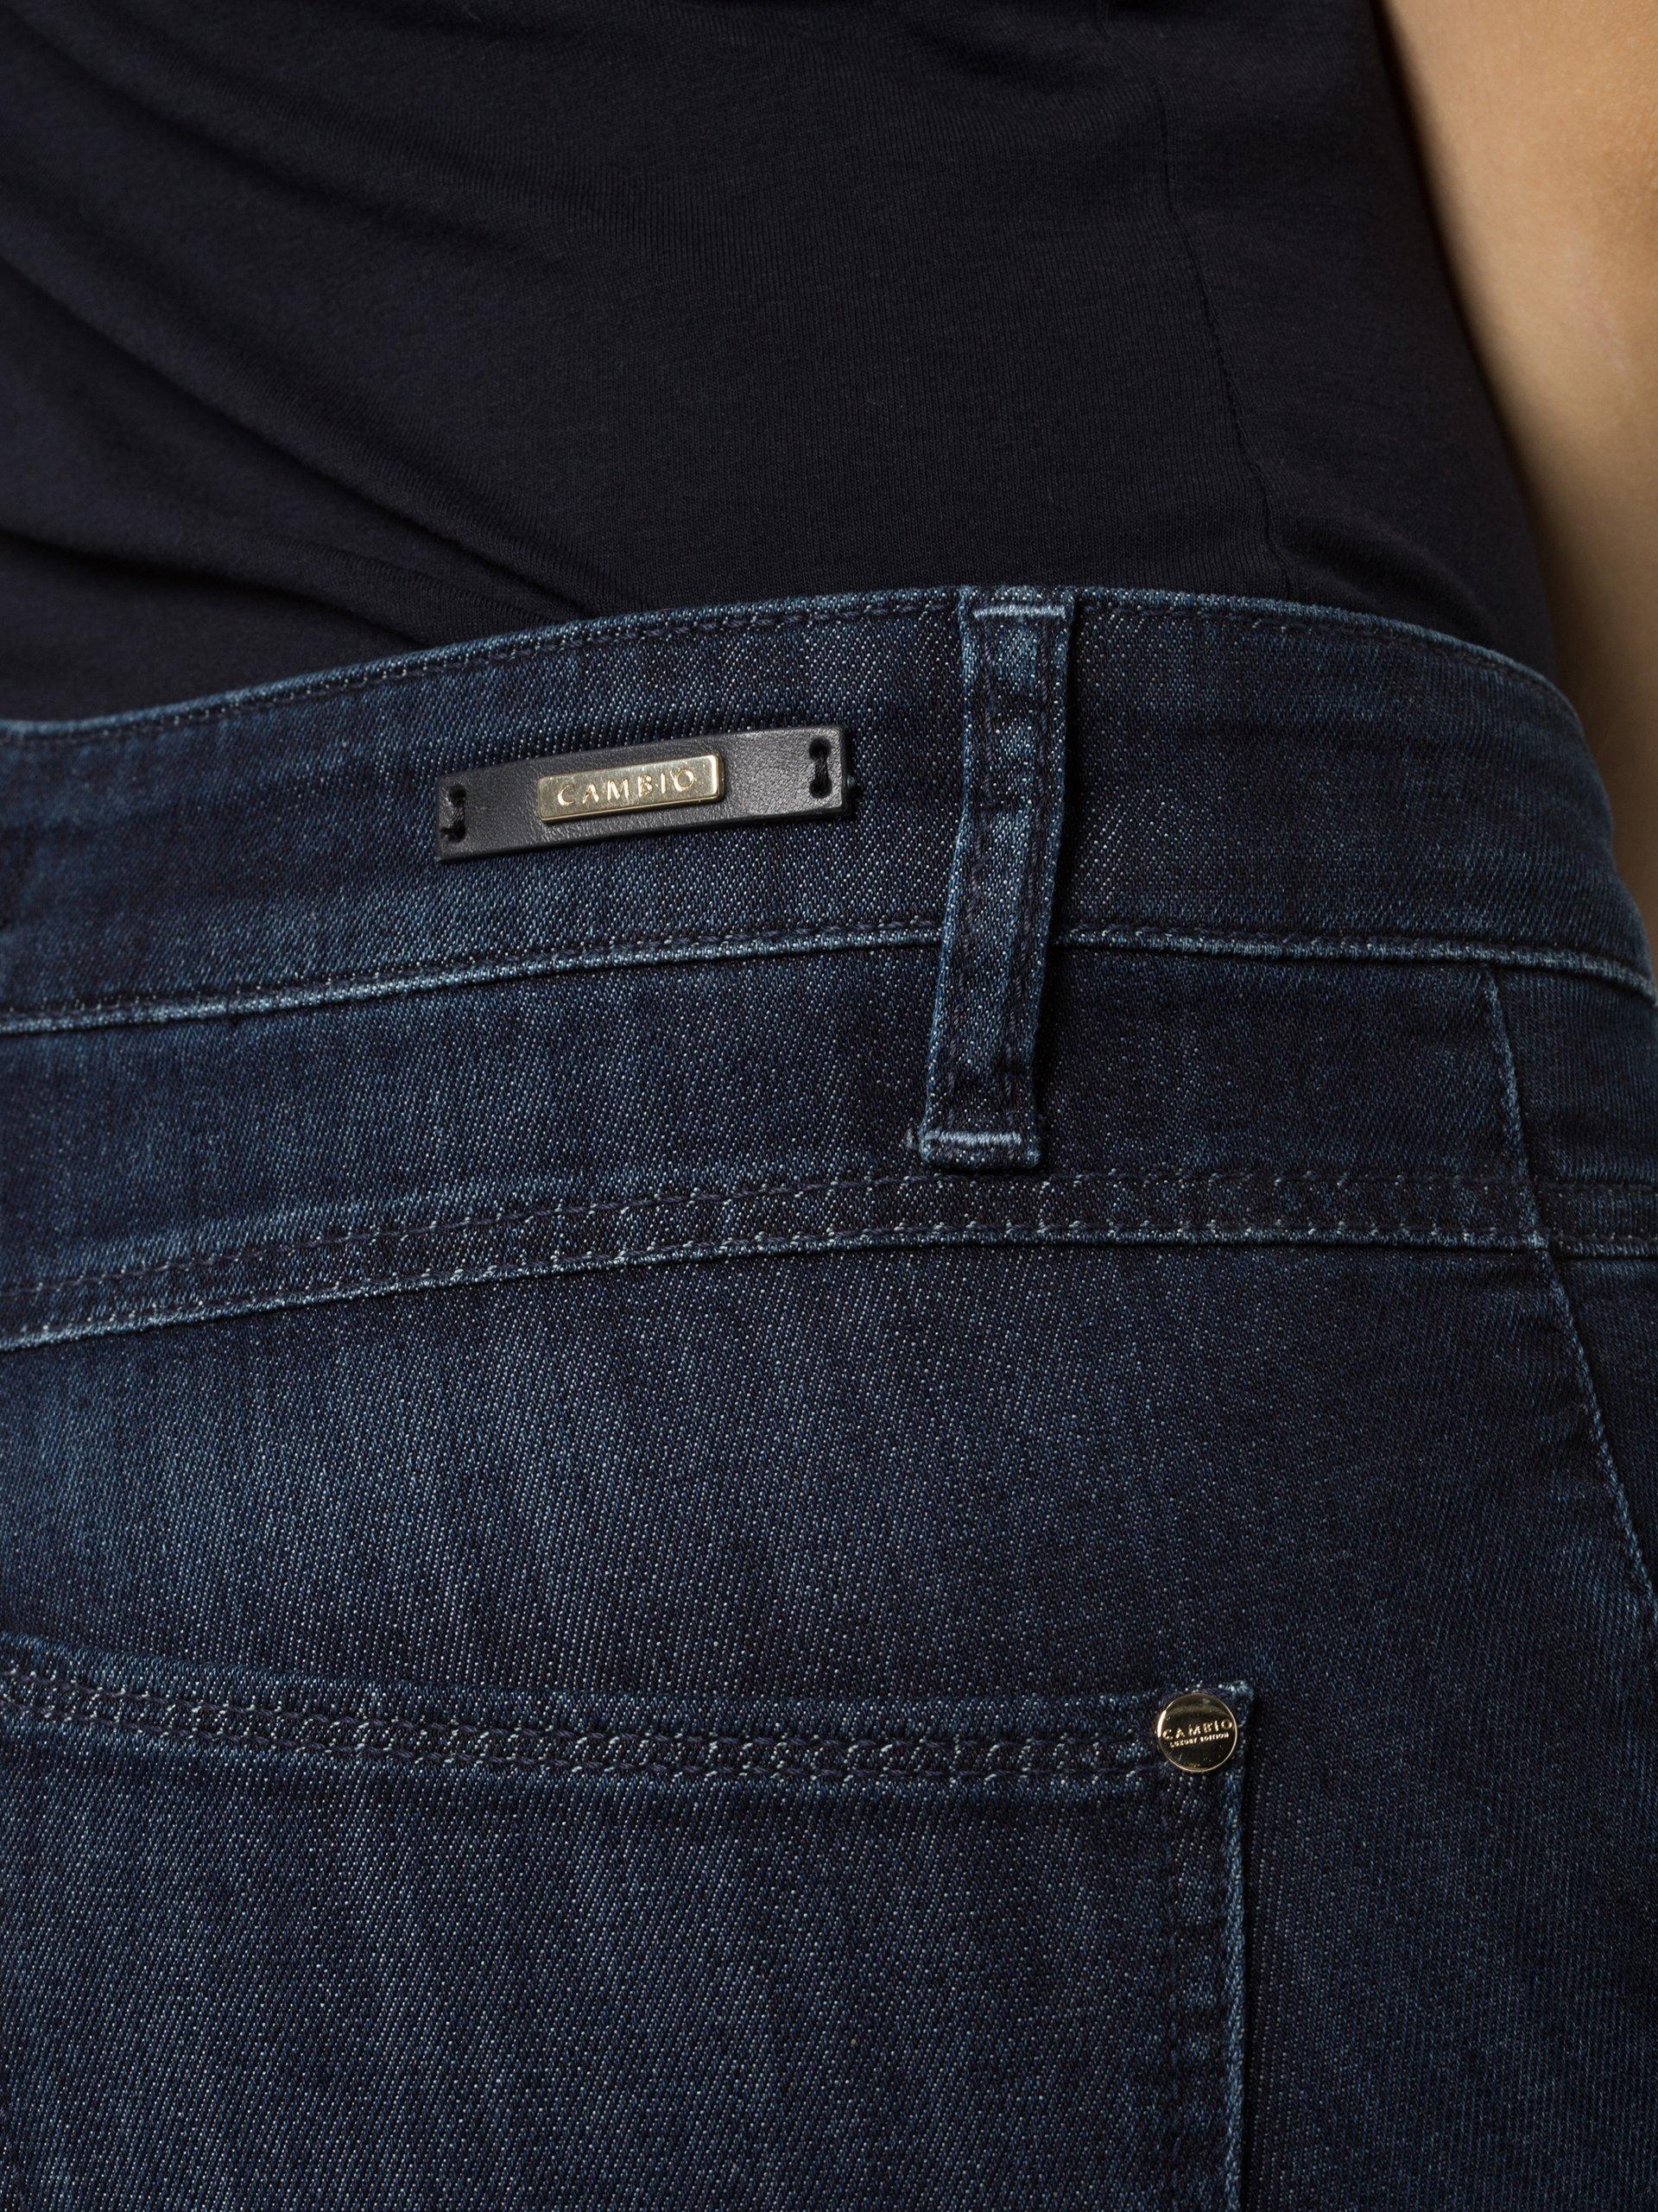 cambio damen jeans posh blau uni online kaufen vangraaf com. Black Bedroom Furniture Sets. Home Design Ideas